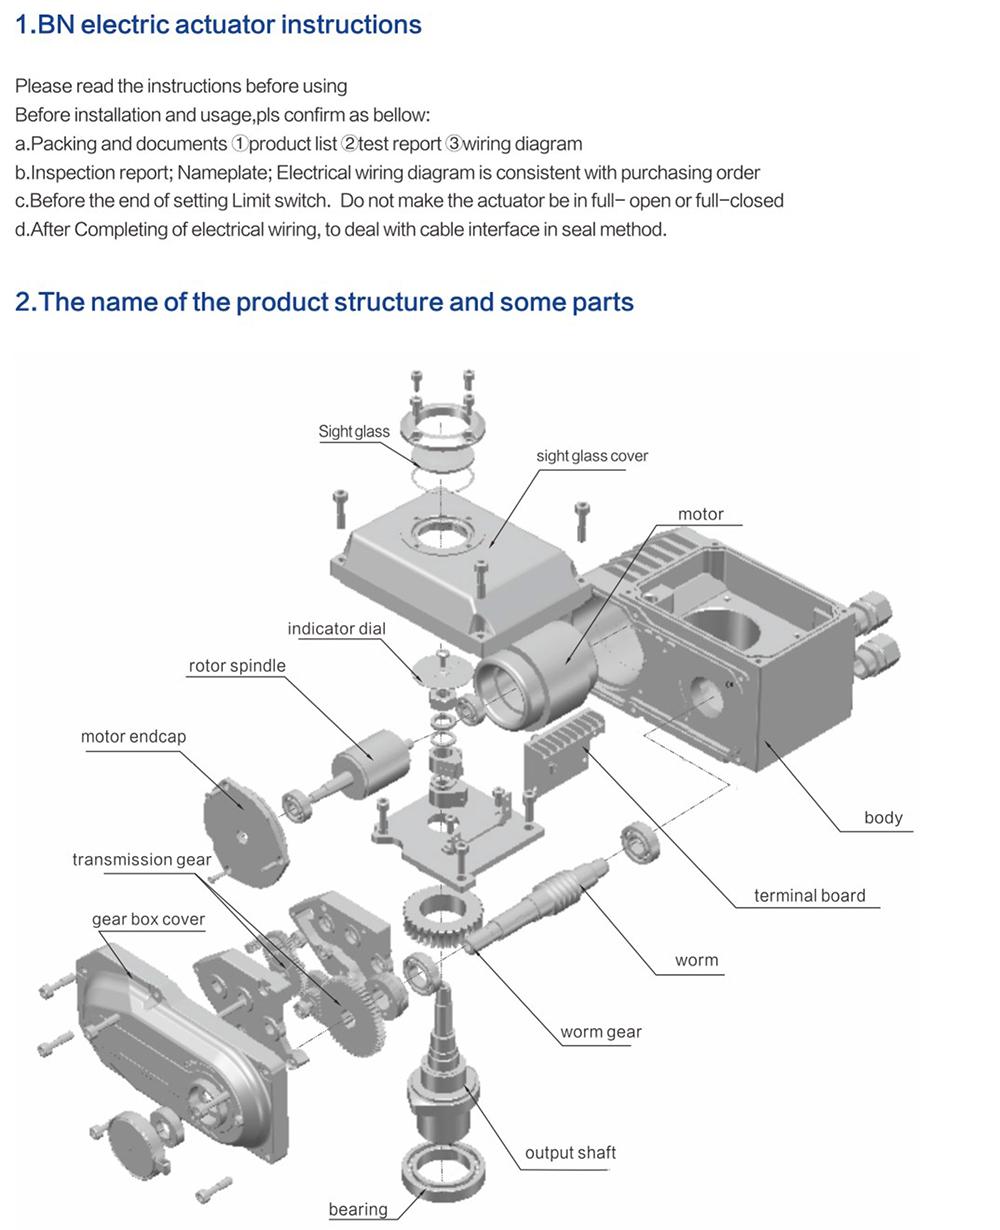 Bn Series Electric Actuator Theoborn Auto Control Valvescoltd Linear 220v Wiring Diagram Description